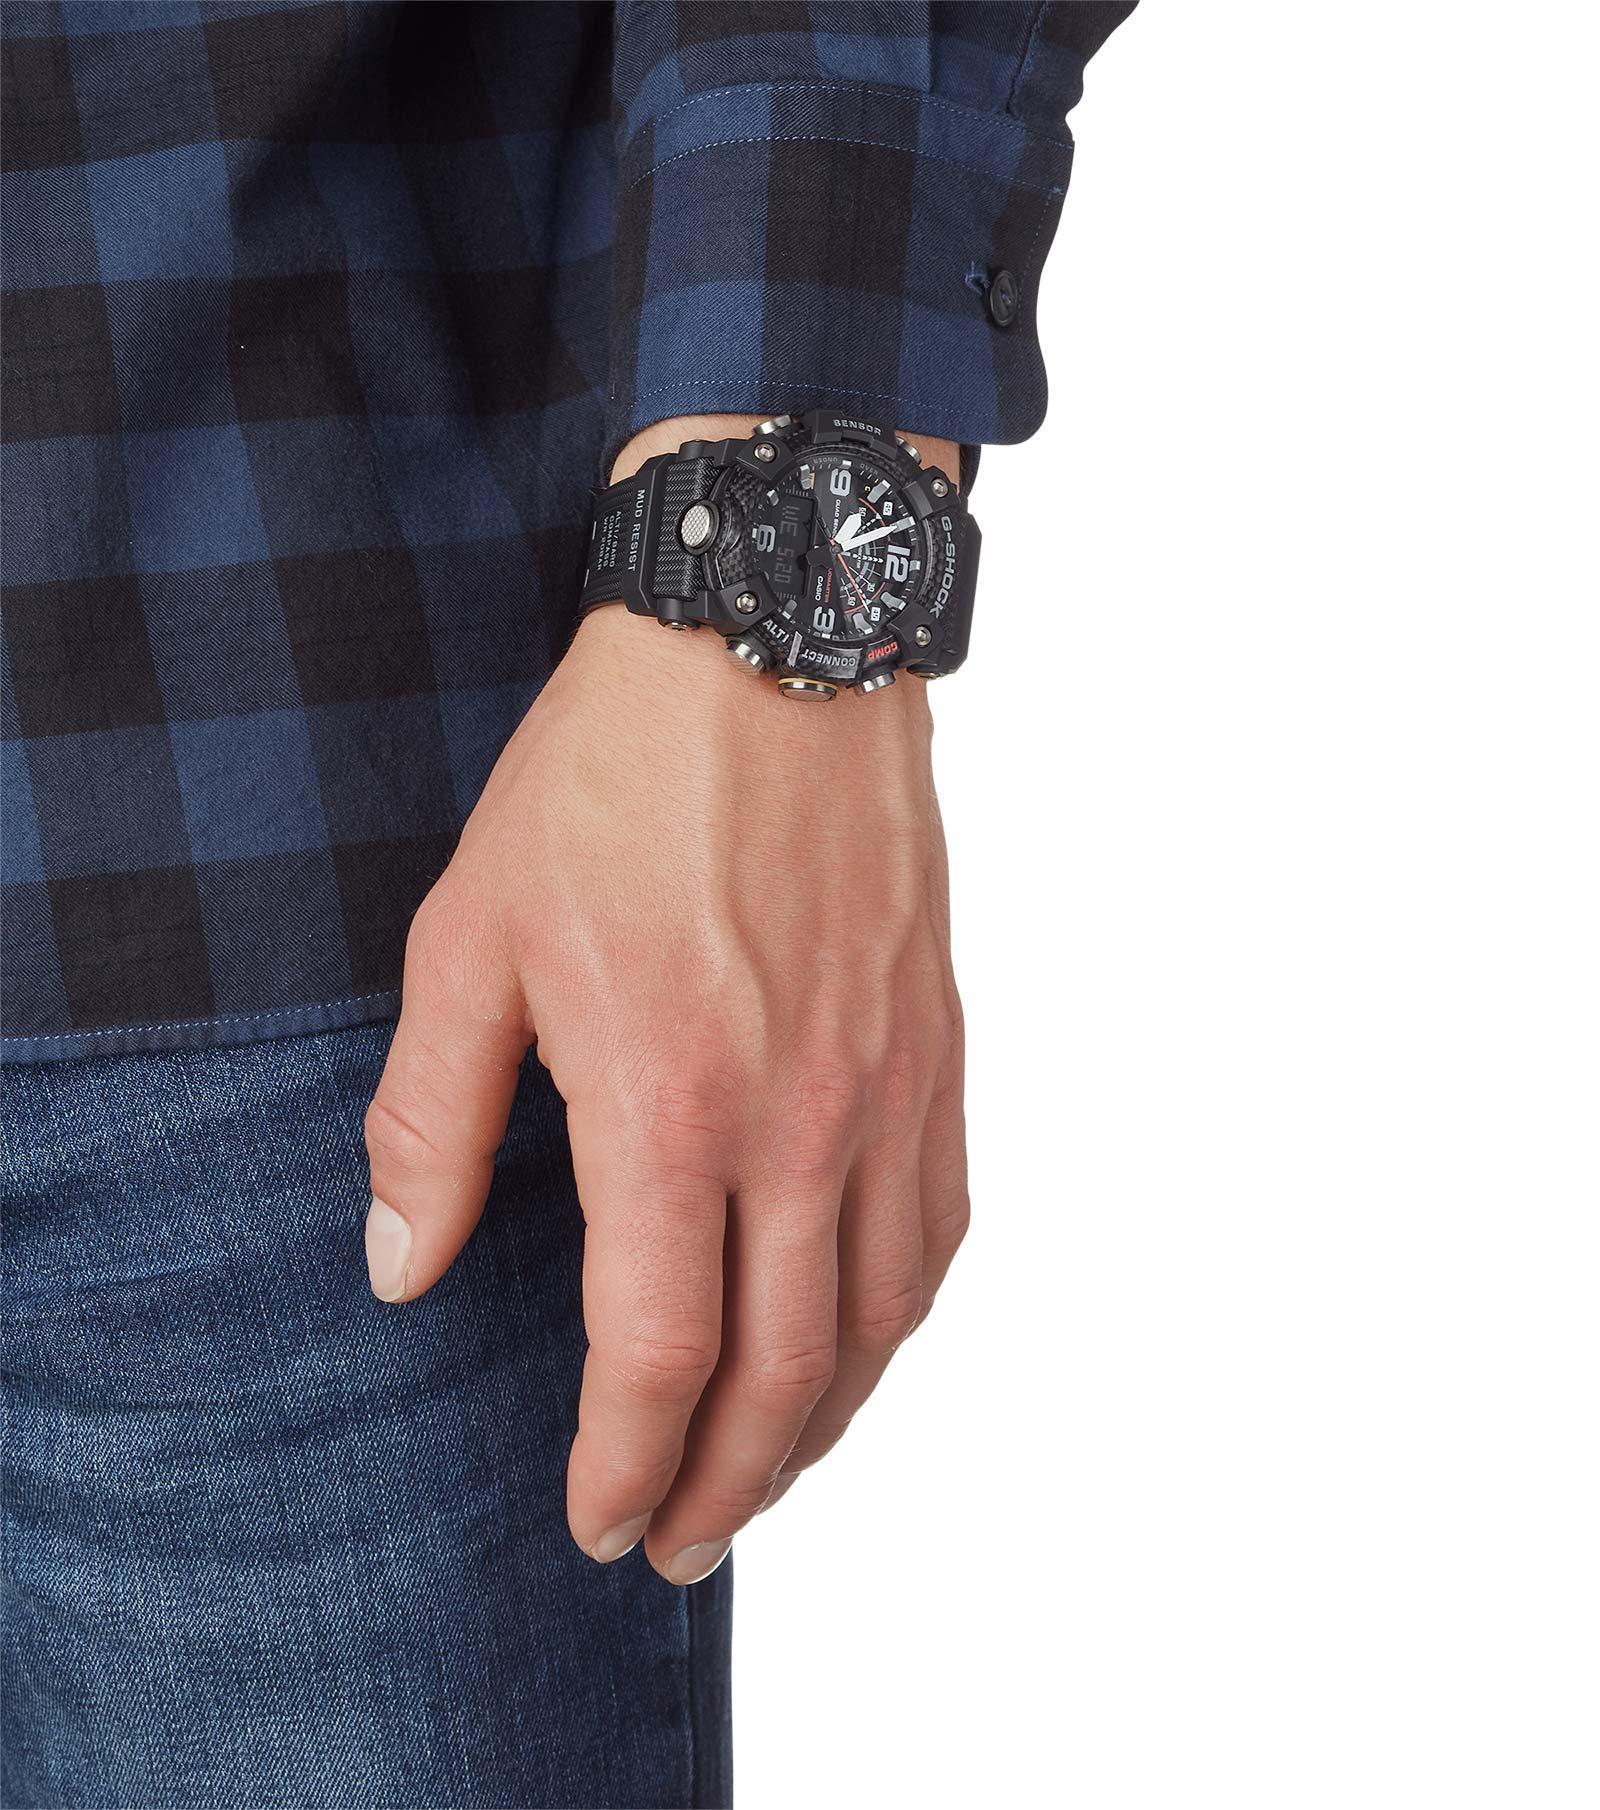 Zegarek męski Casio g-shock master of g GG-B100-1AER - duże 2